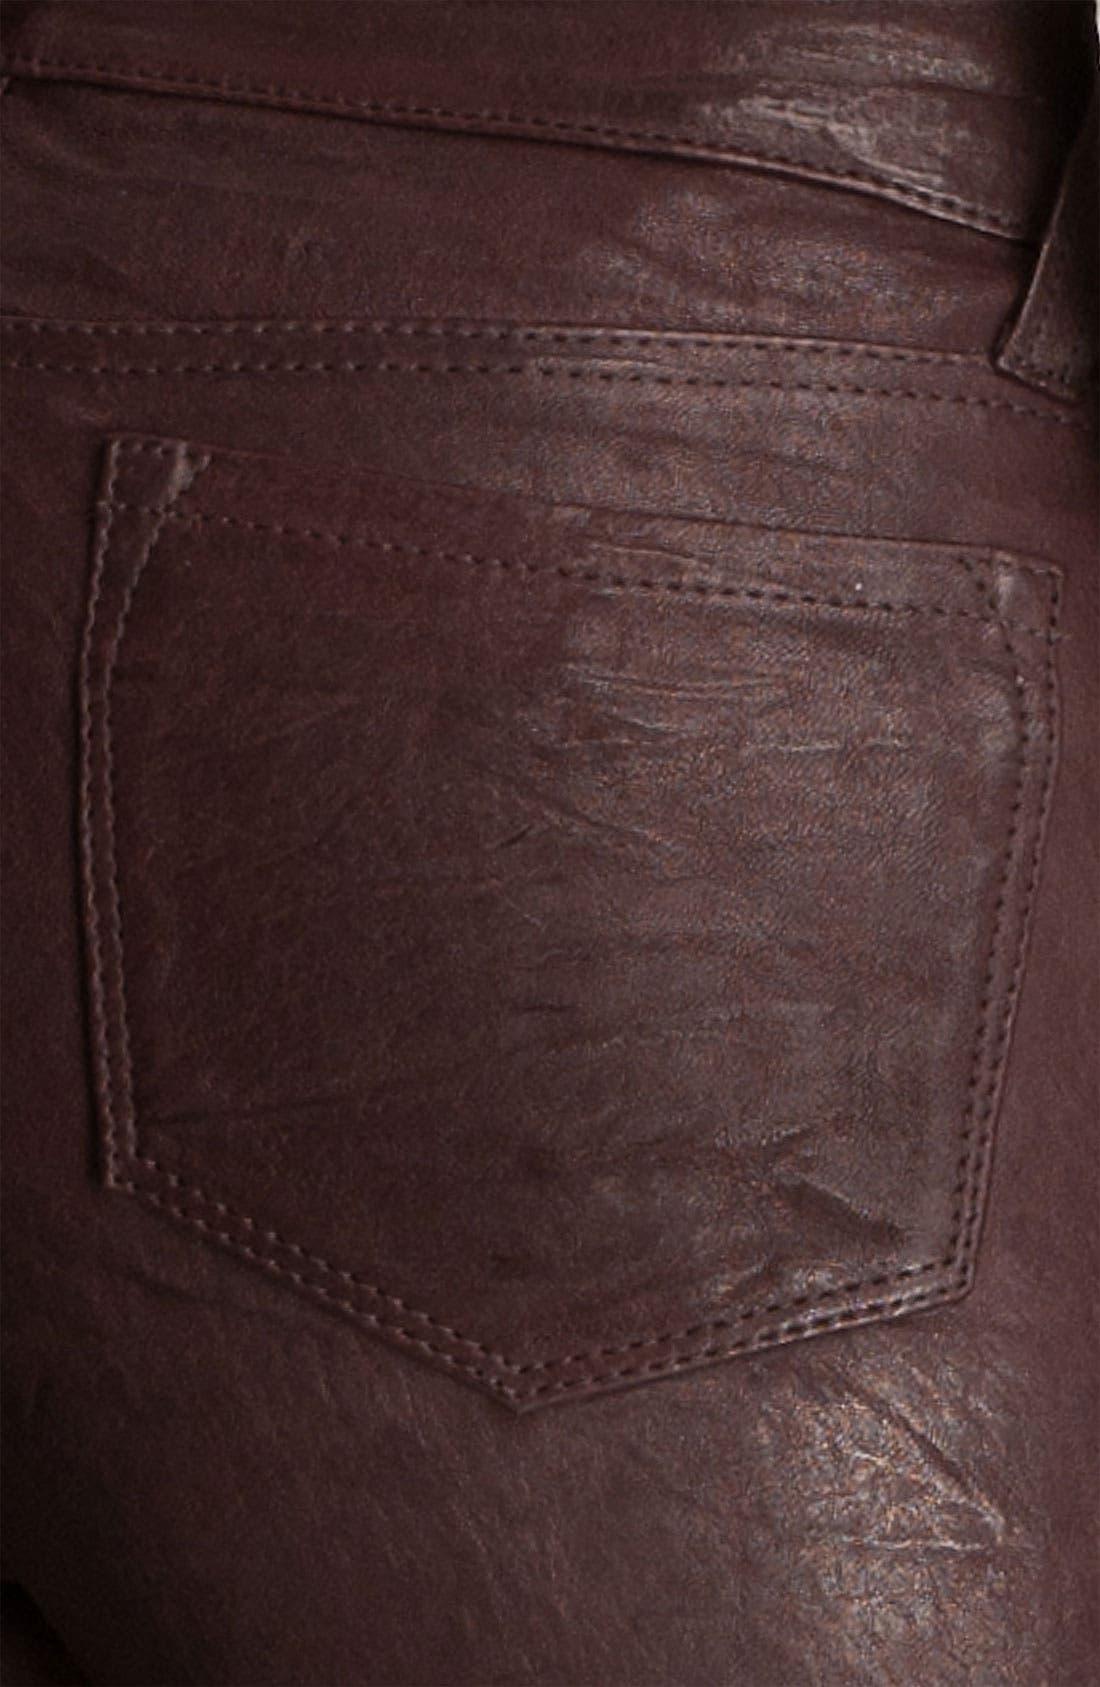 '8001' Lambskin Leather Pants,                             Alternate thumbnail 43, color,